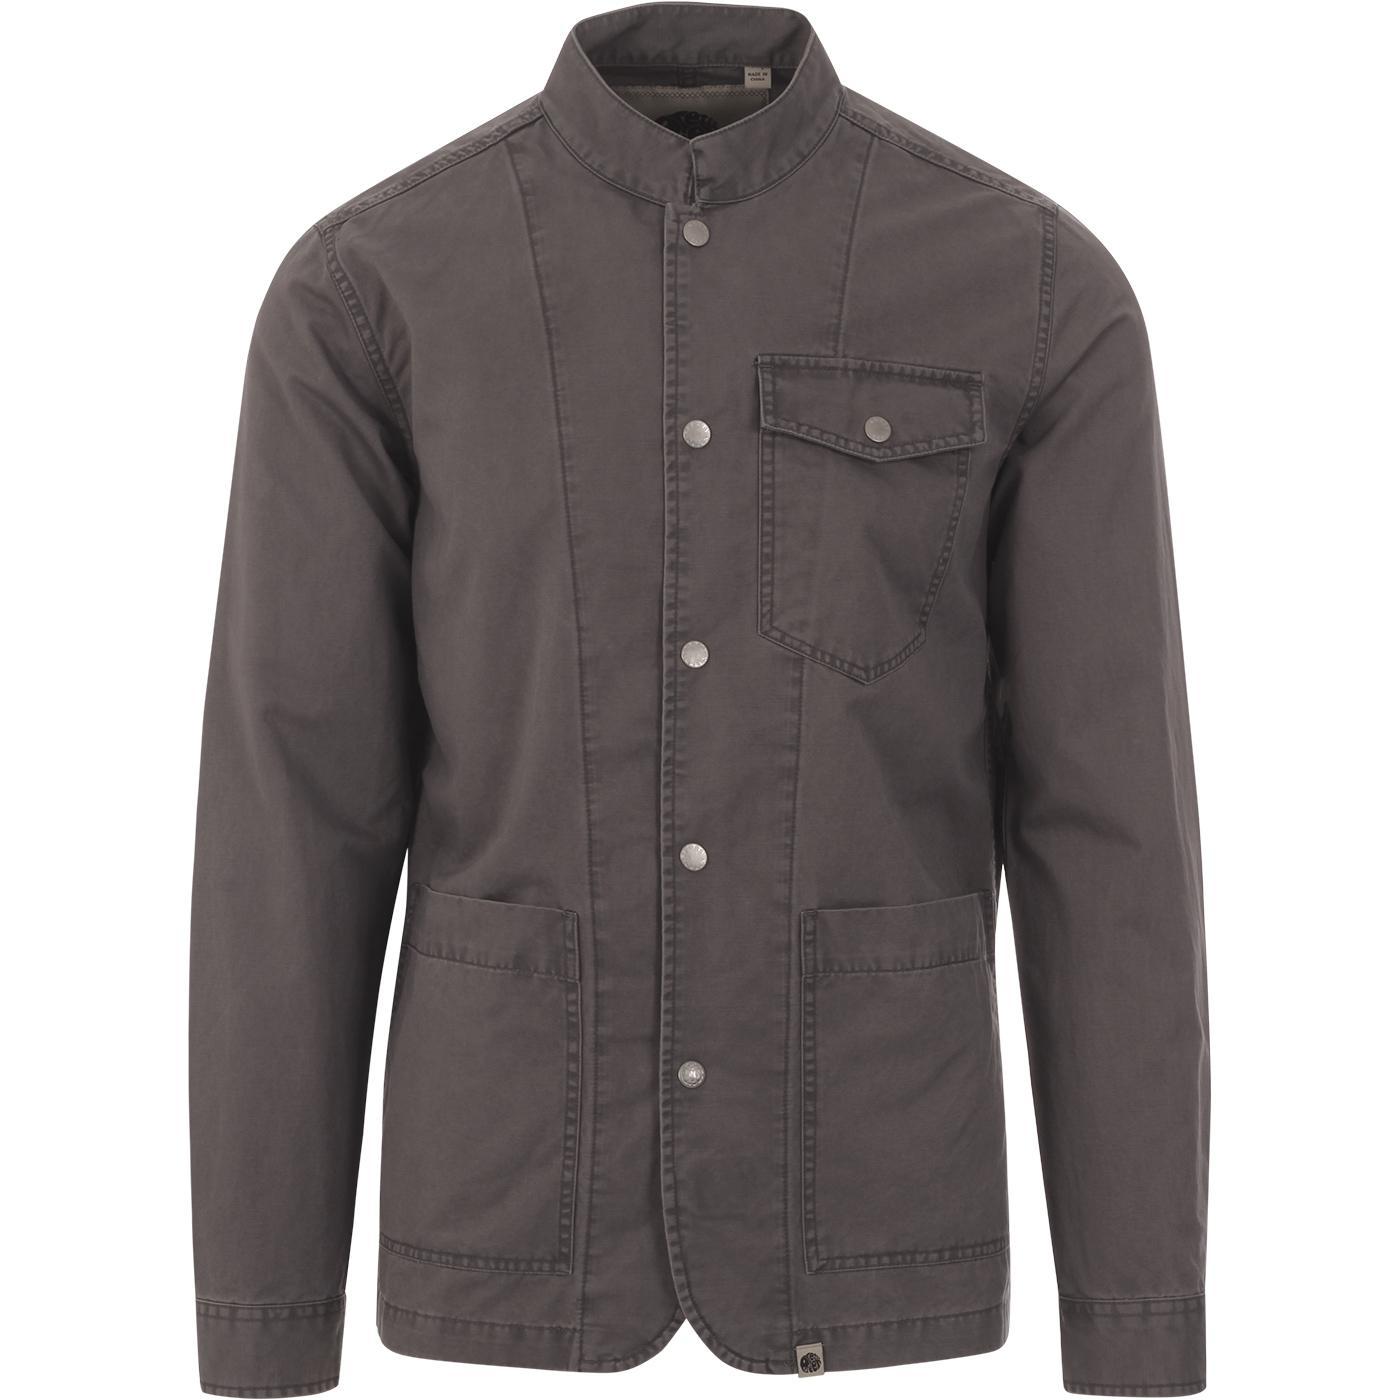 PRETTY GREEN Mod Cotton Collarless Shirt Jacket G